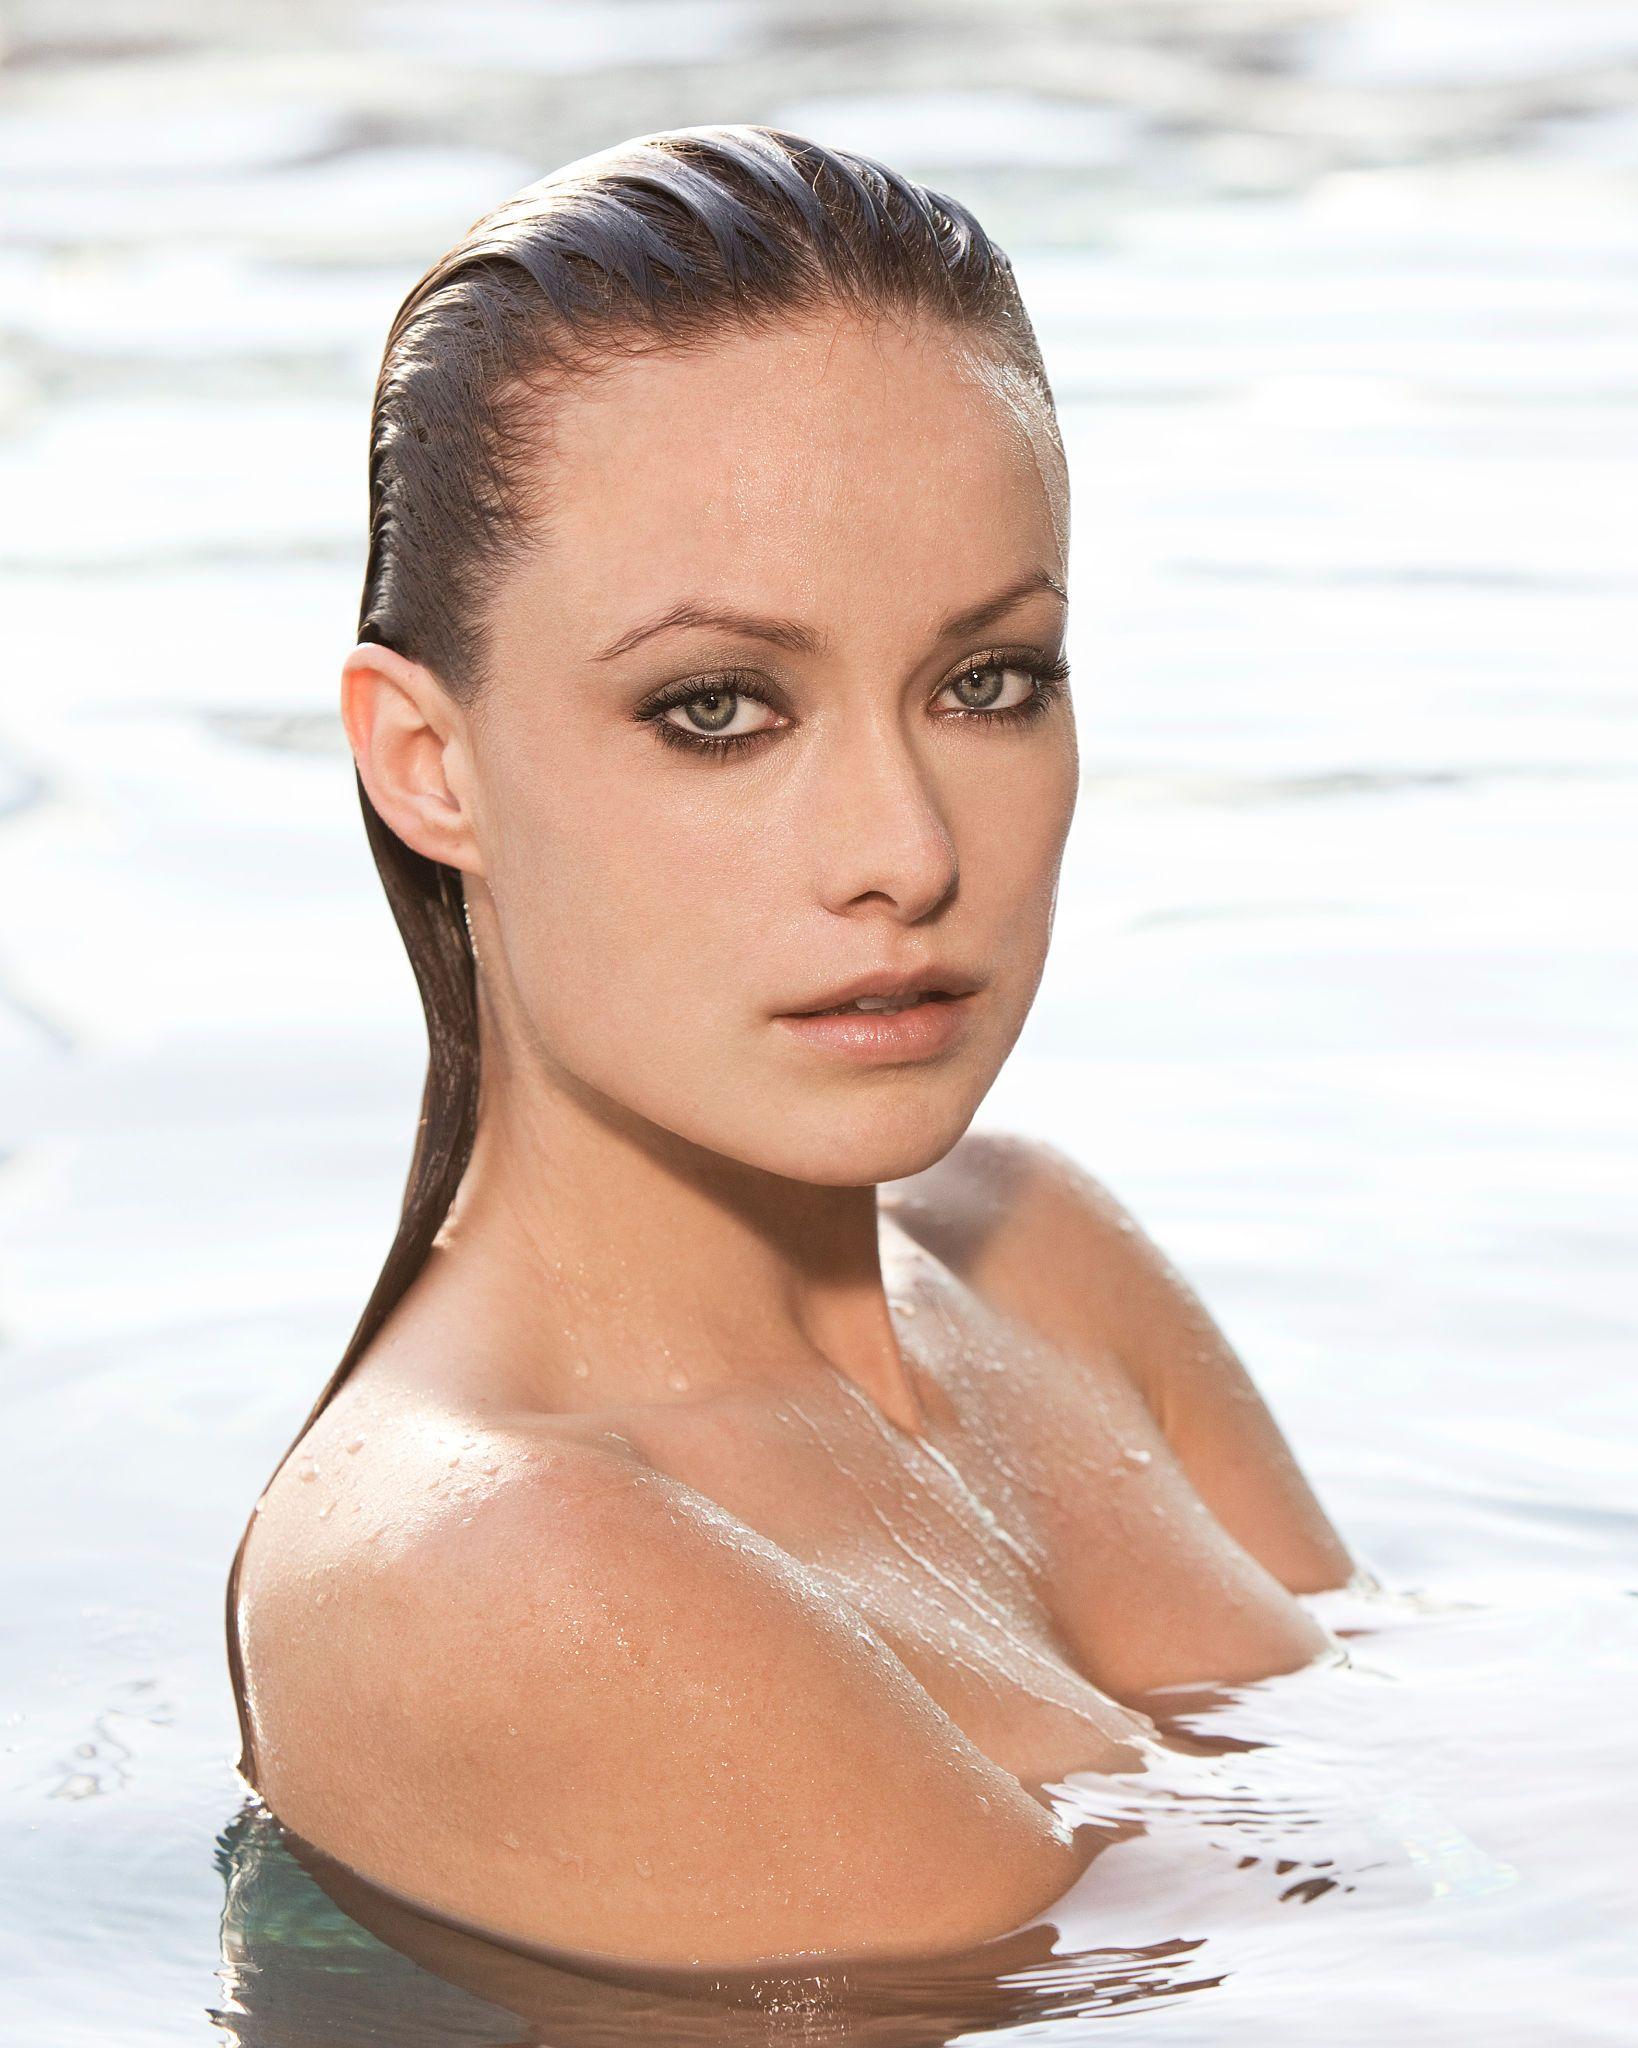 TV Actress Olivia Wilde Topless • Fappening Sauce